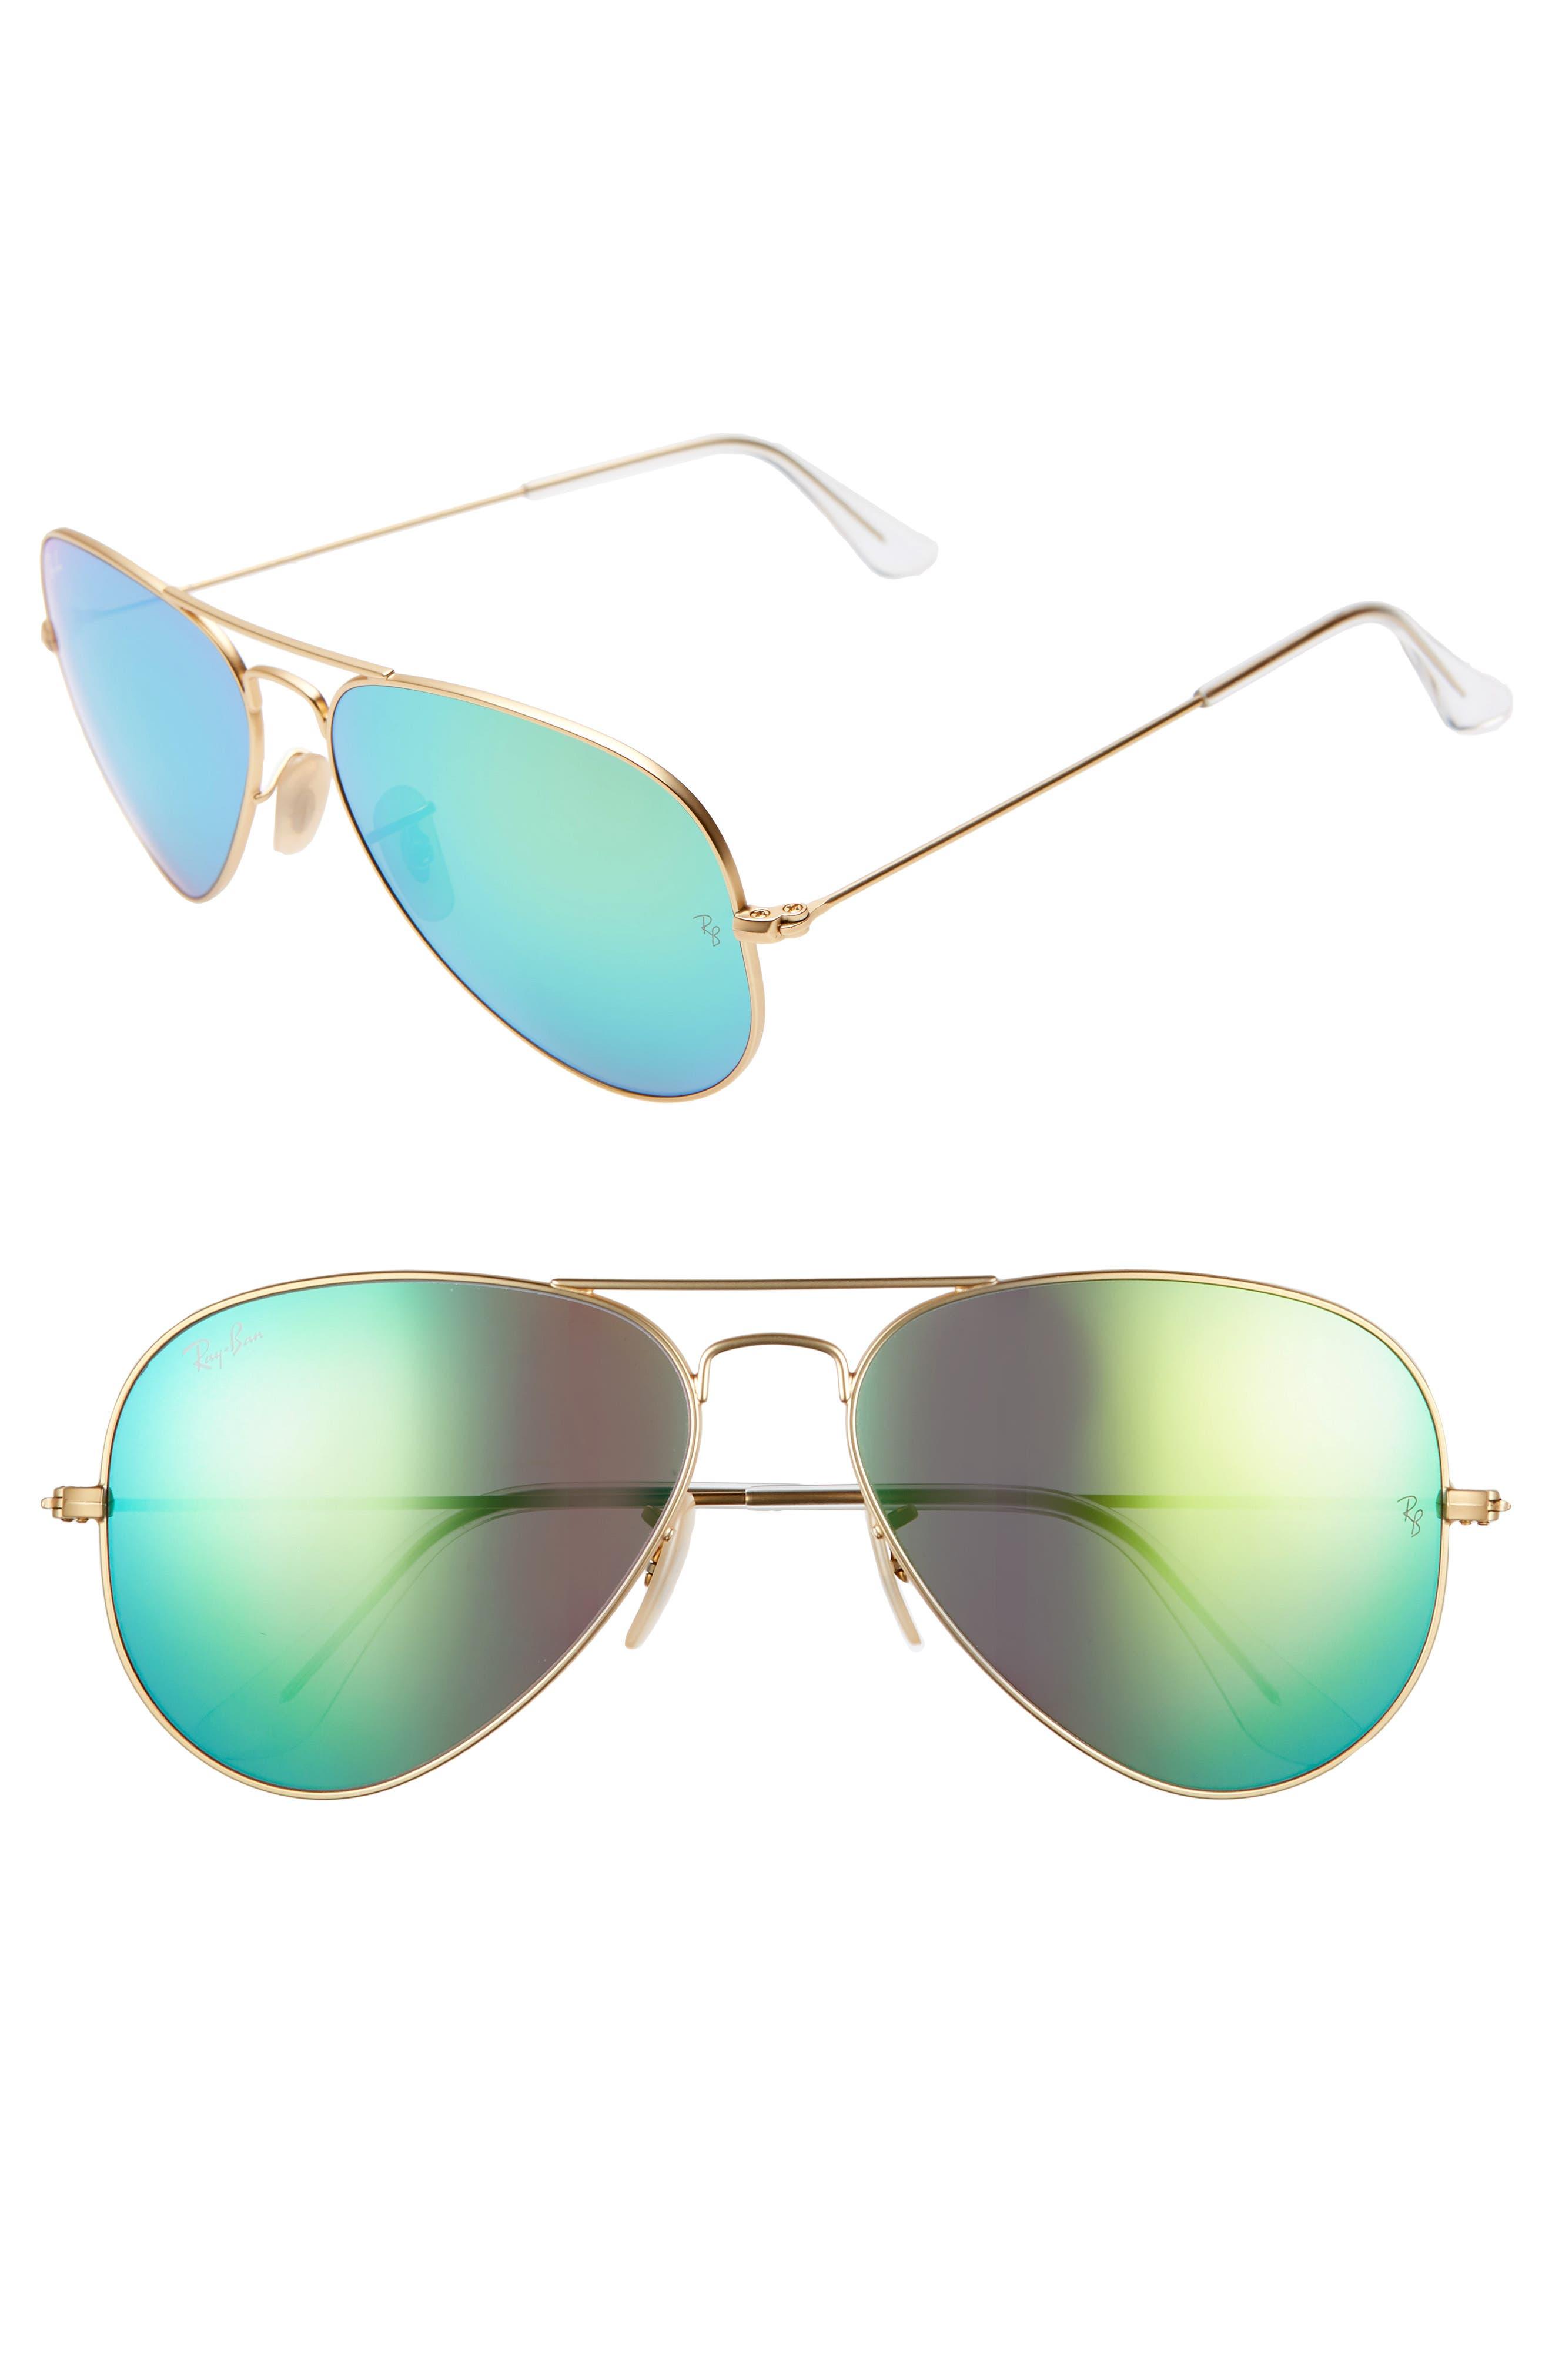 Ray-Ban 5m Mirrored Aviator Sunglasses - Gold/ Green Flash Mirror